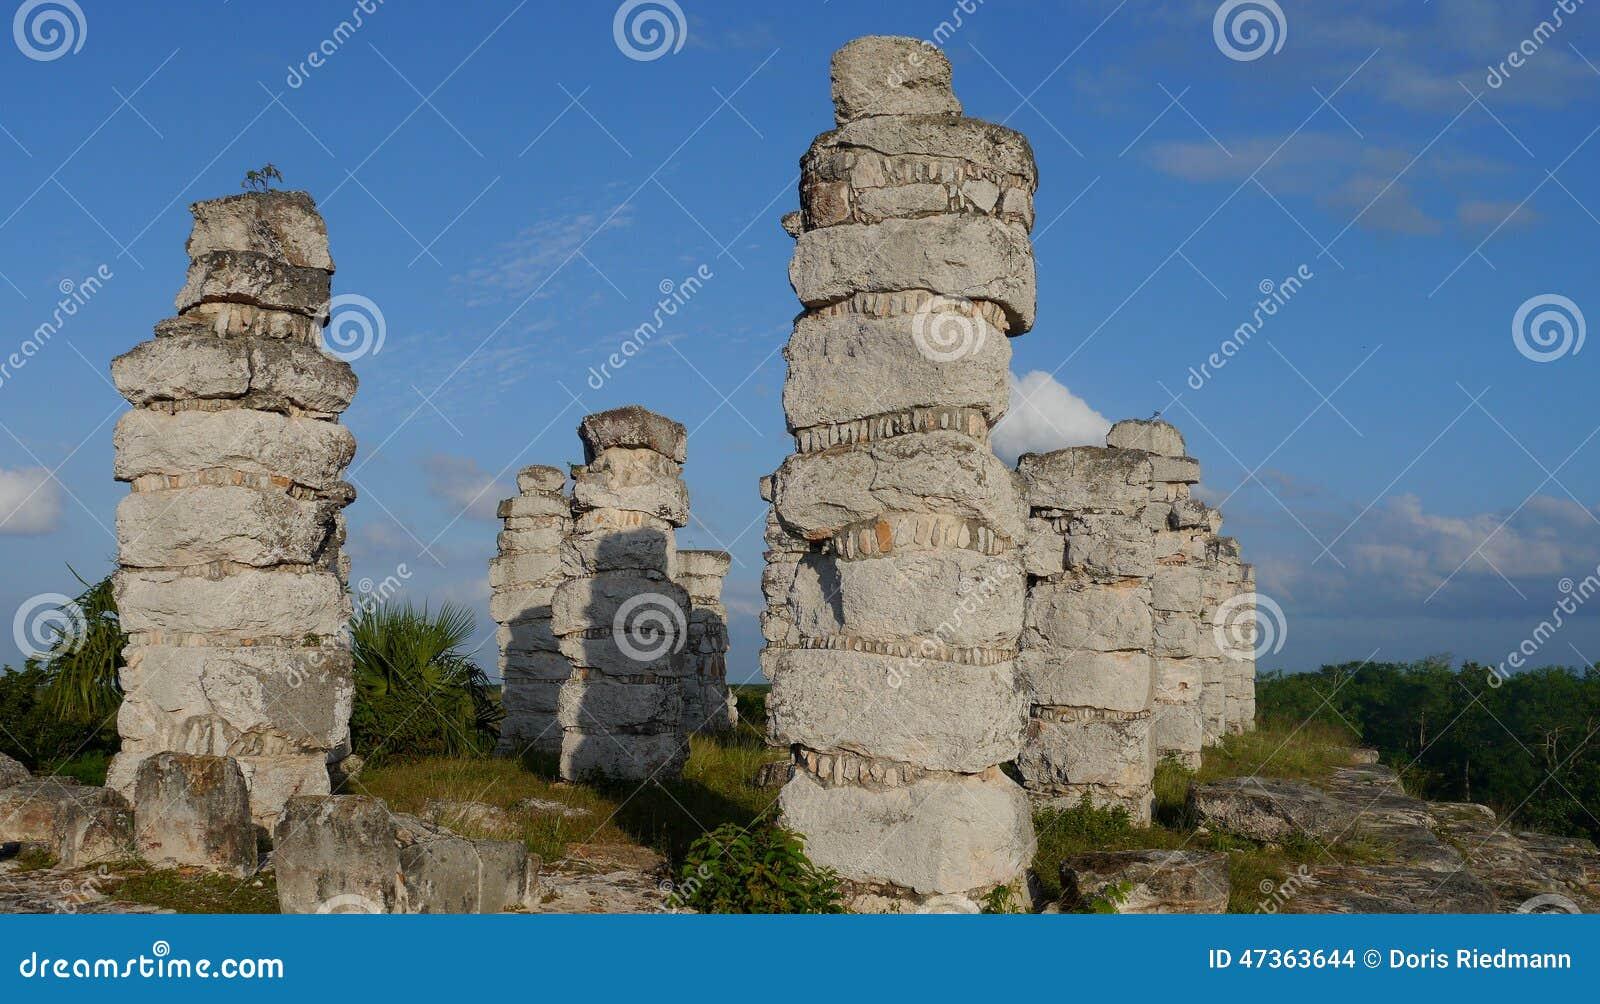 Ake pyramid Maya mexico history culture travel sigtseeing tourism